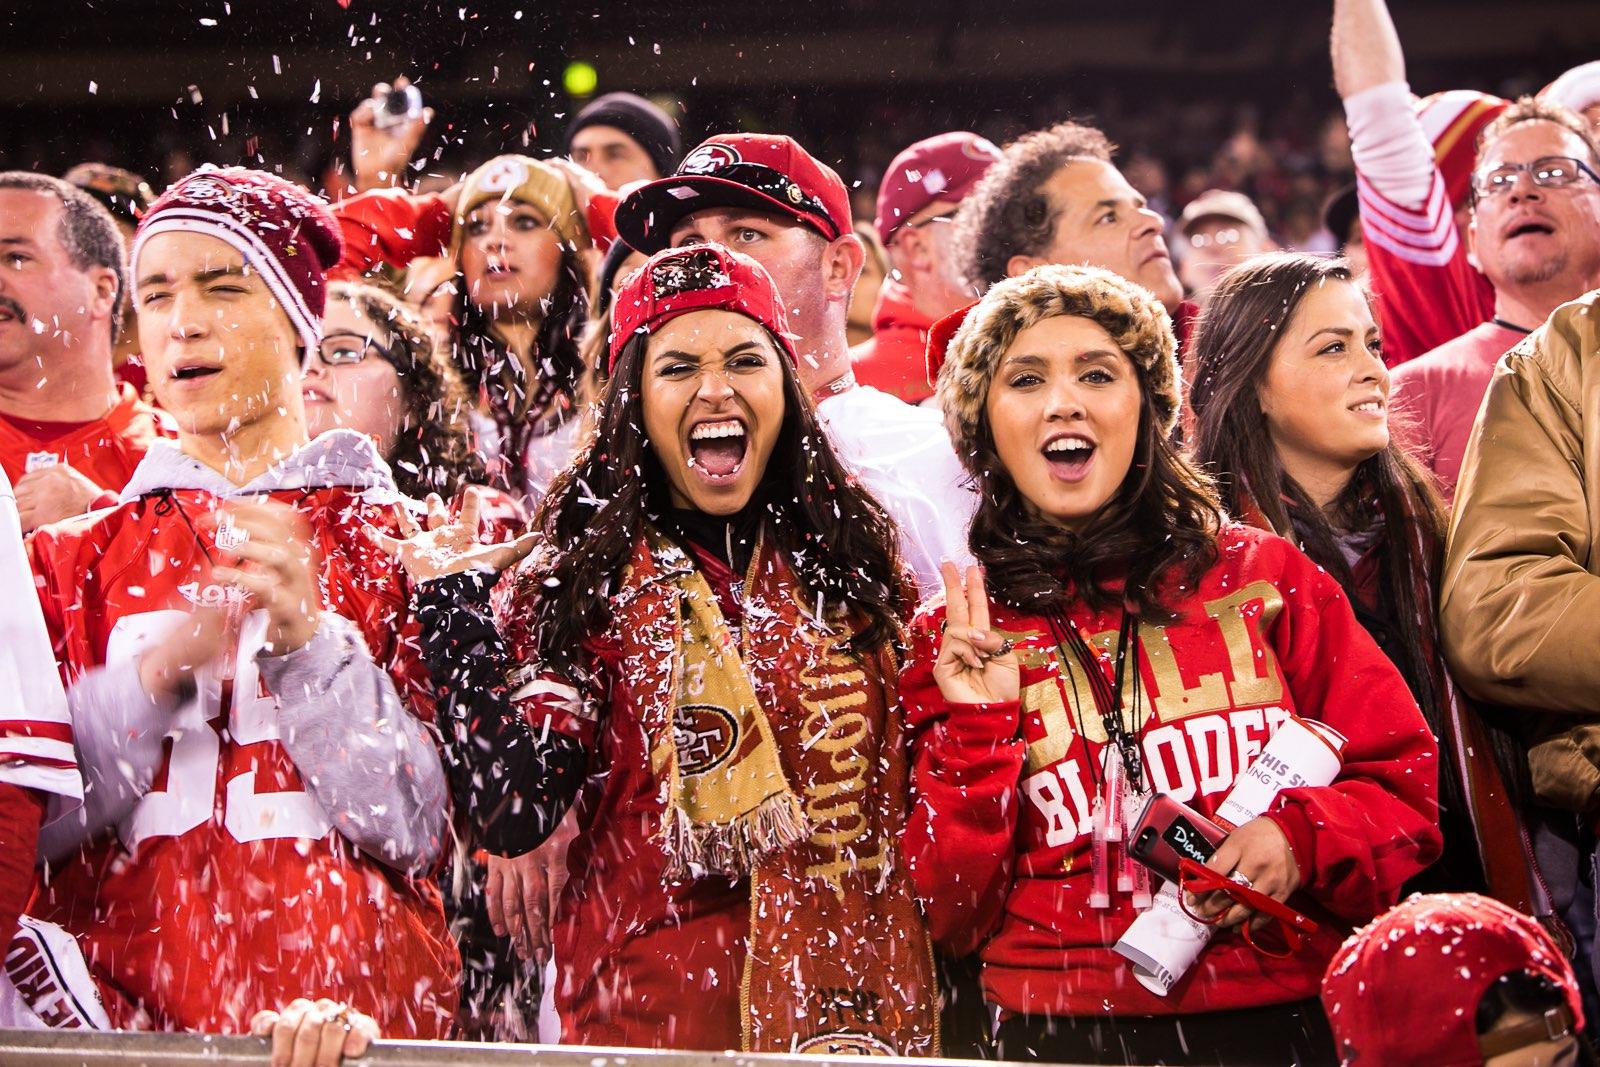 SF-49ers-fans-cheering-in-snow Nightlife